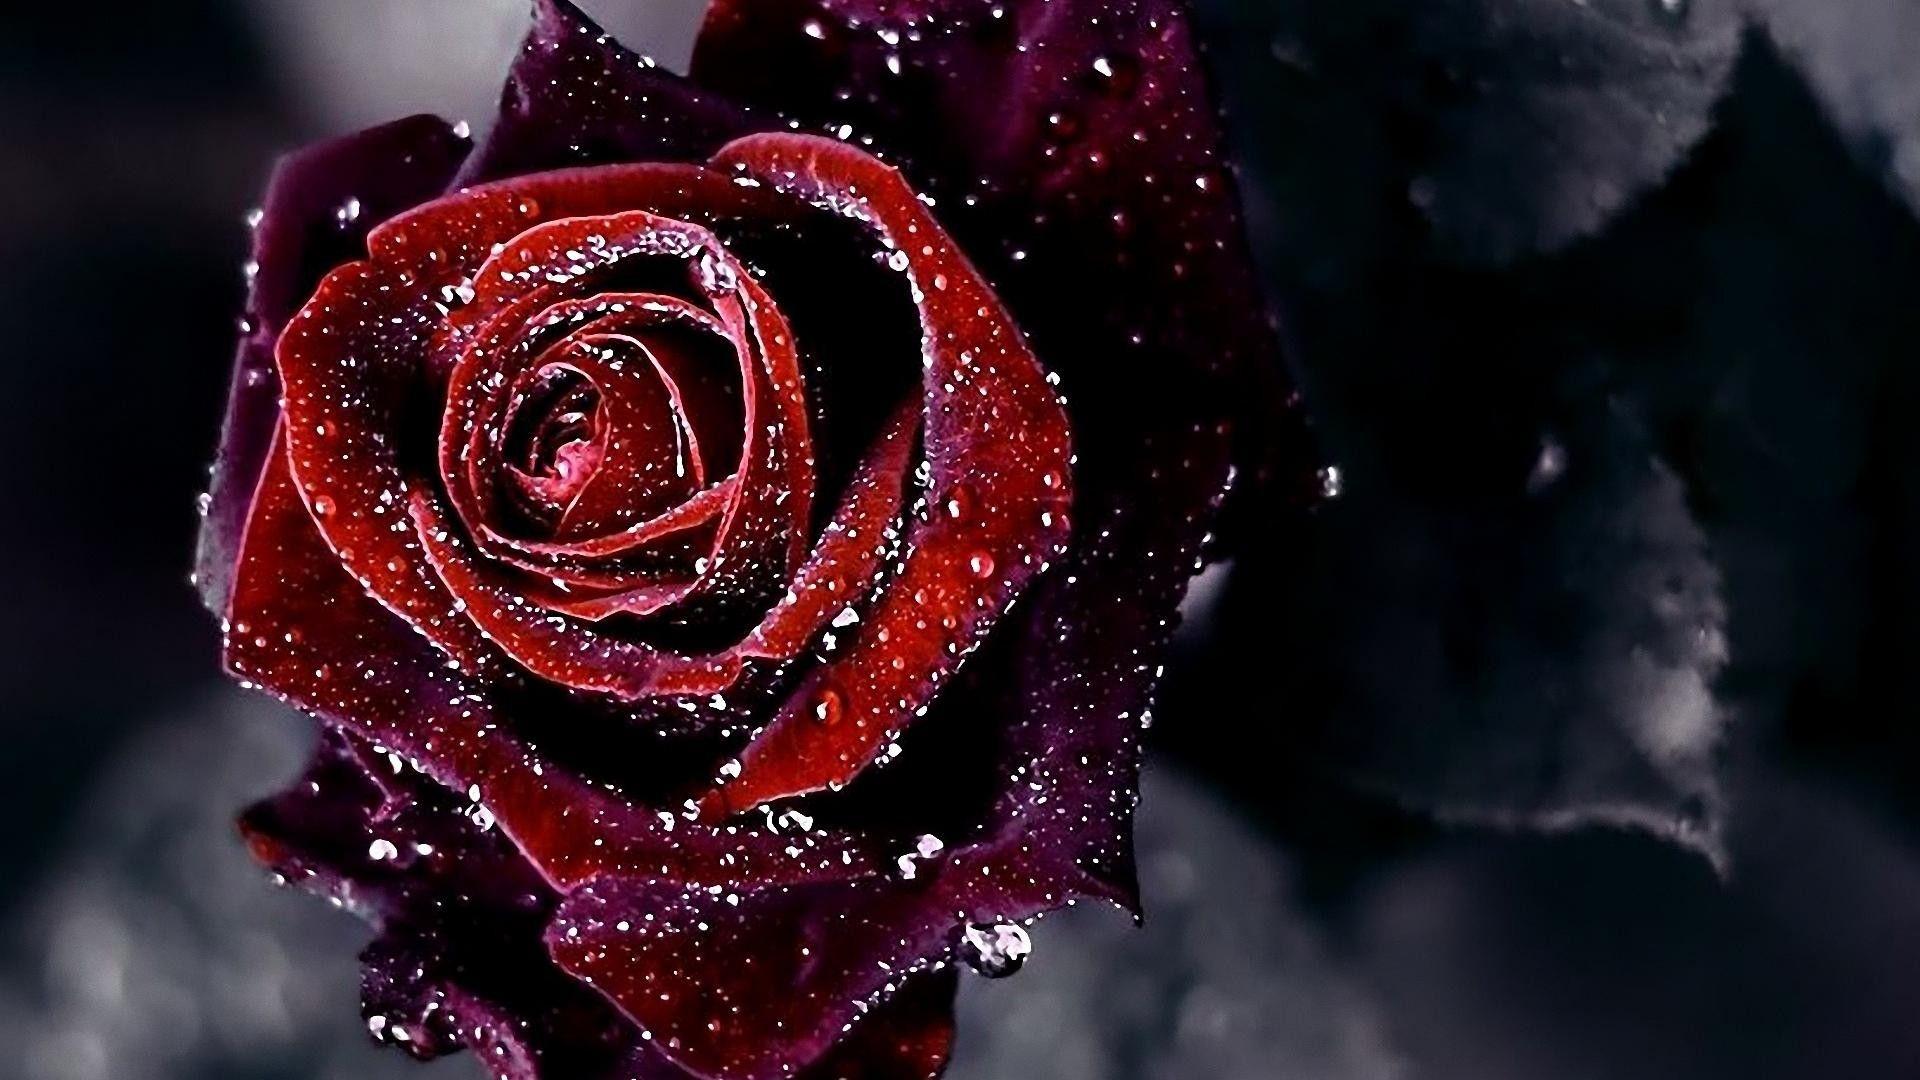 Red Rose Wallpapers Free Download Sf Wallpaper